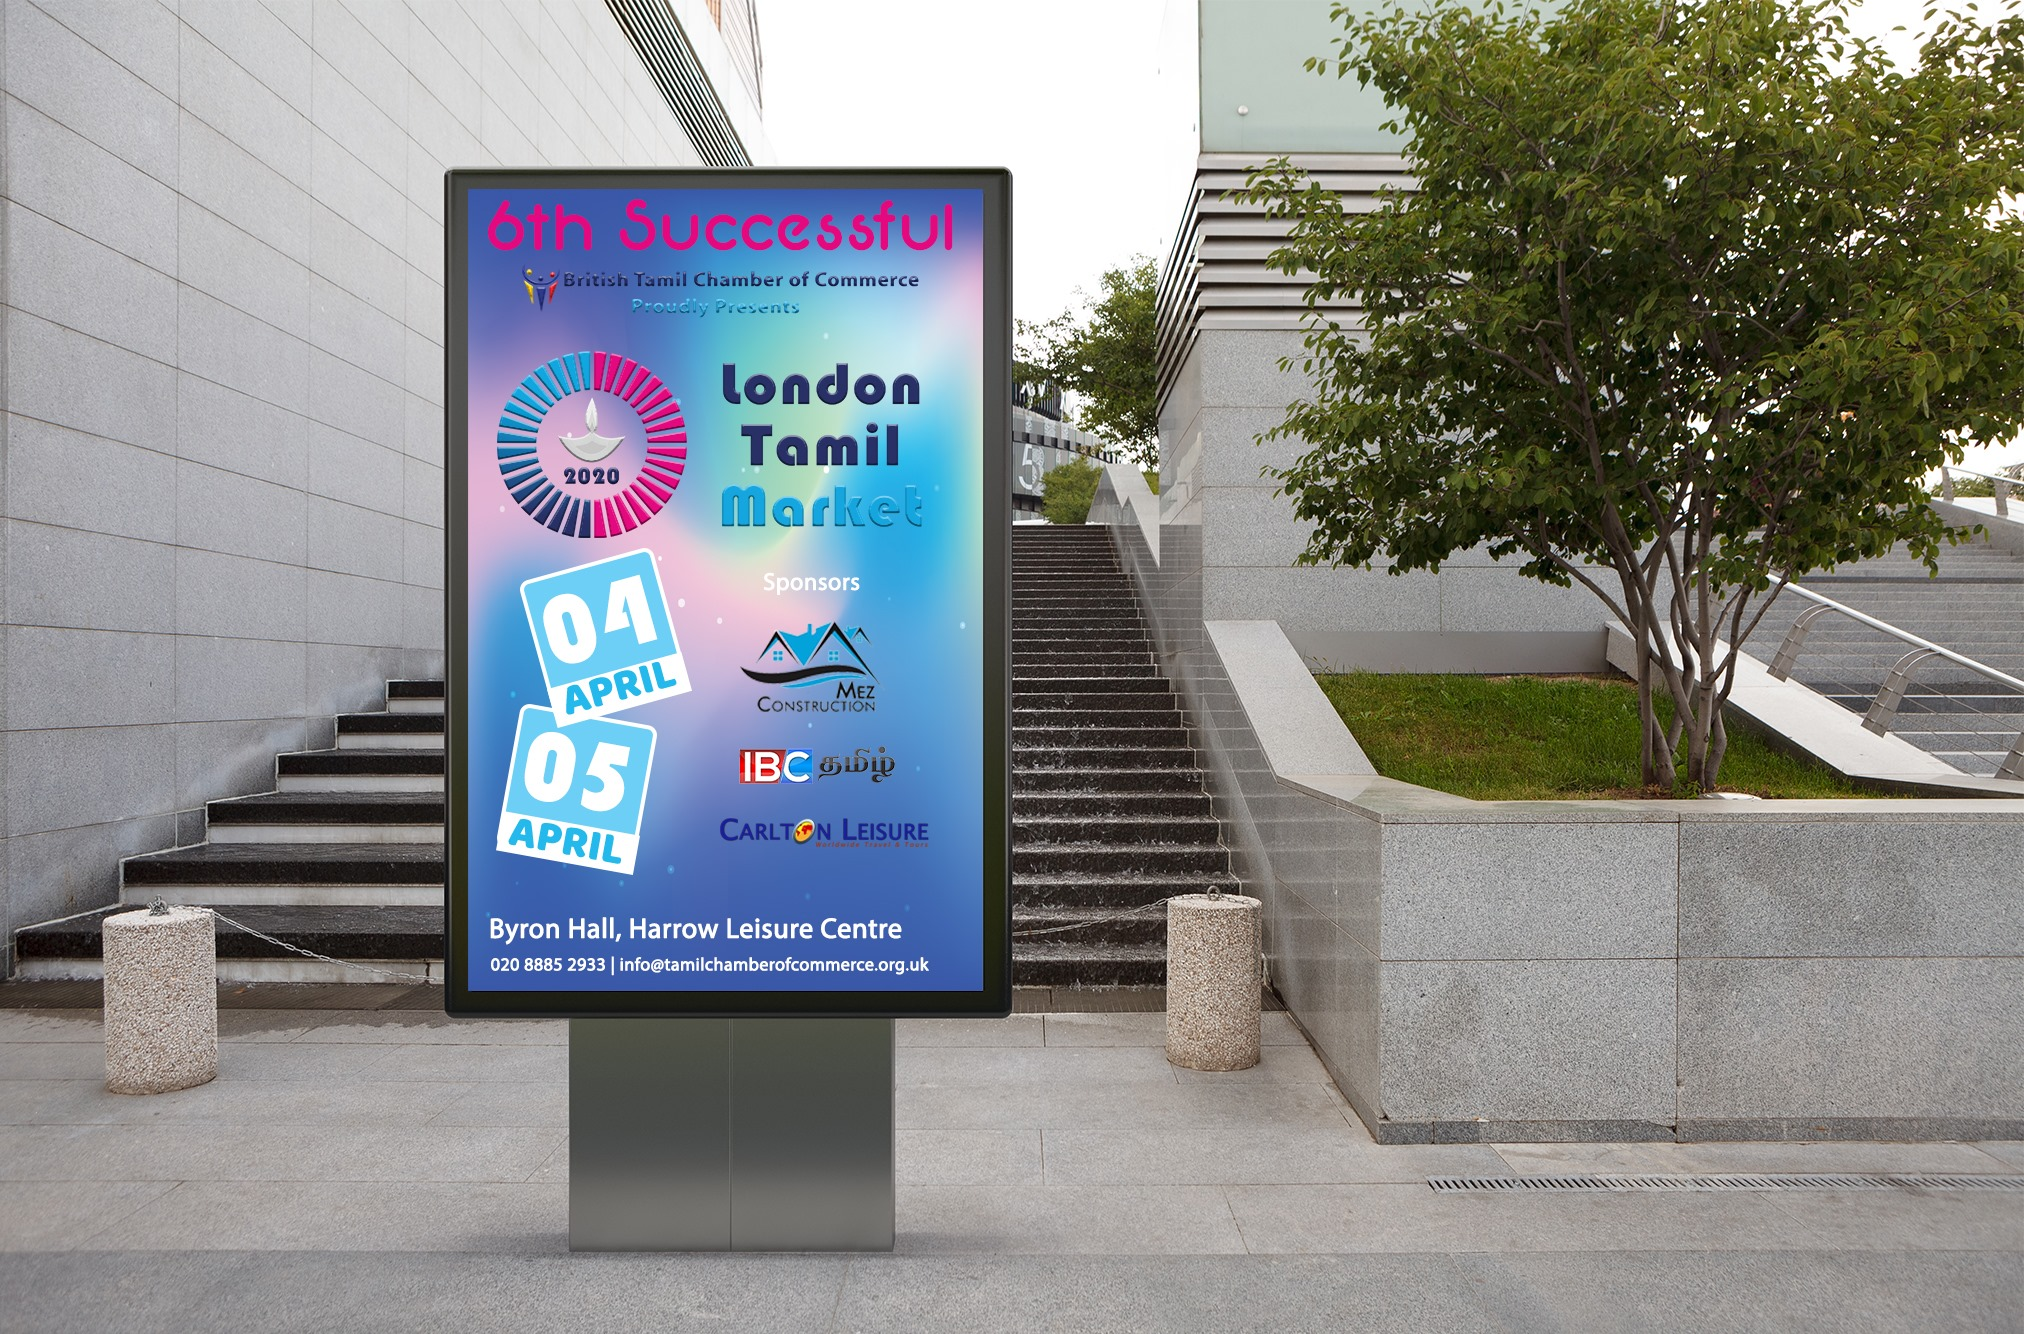 London Tamil Market 2020 | British Tamil Chamber of Commerce